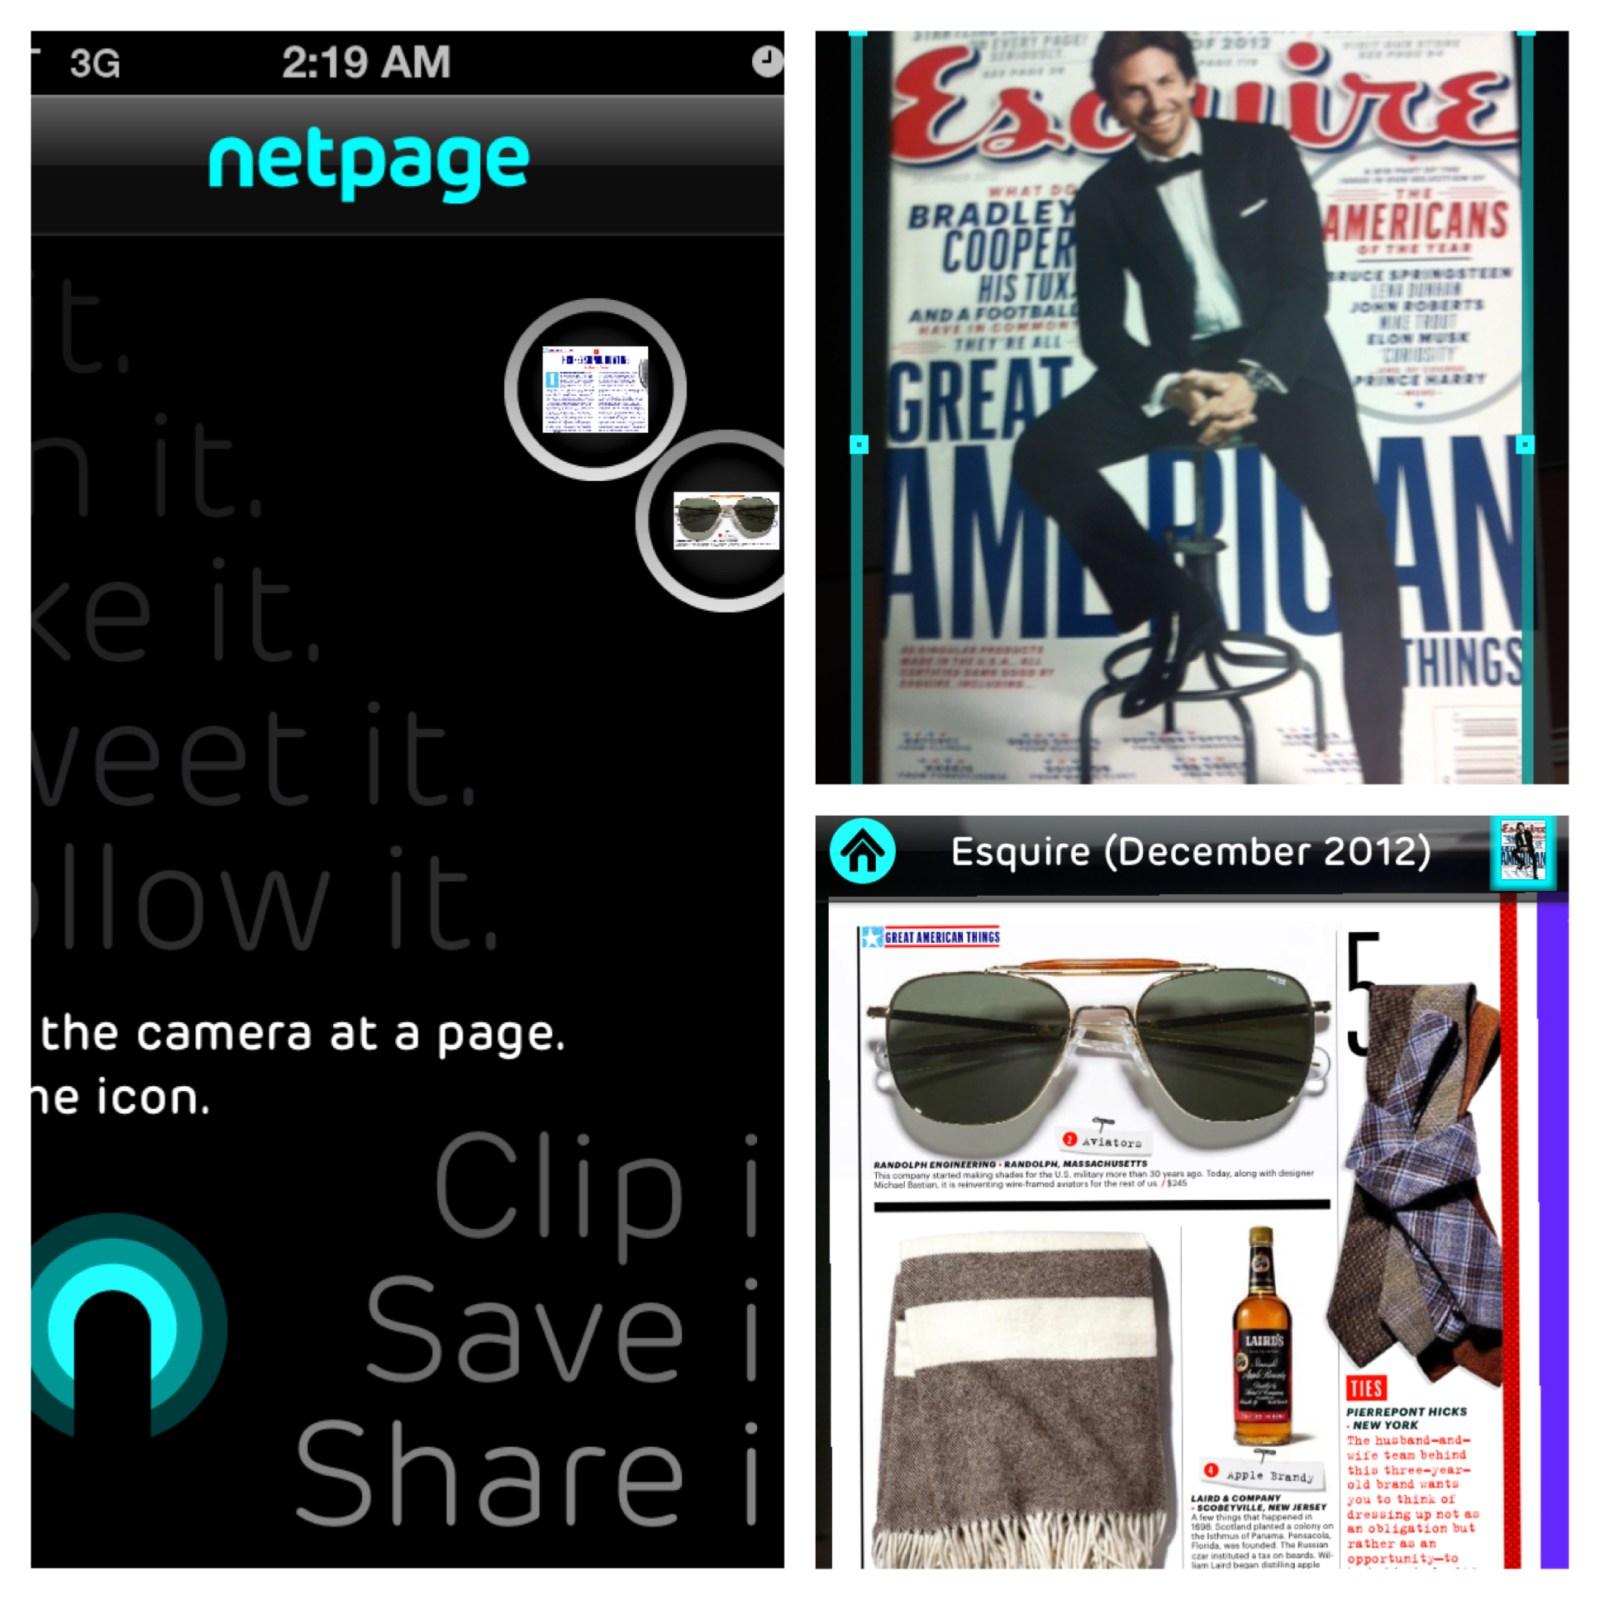 netpage app